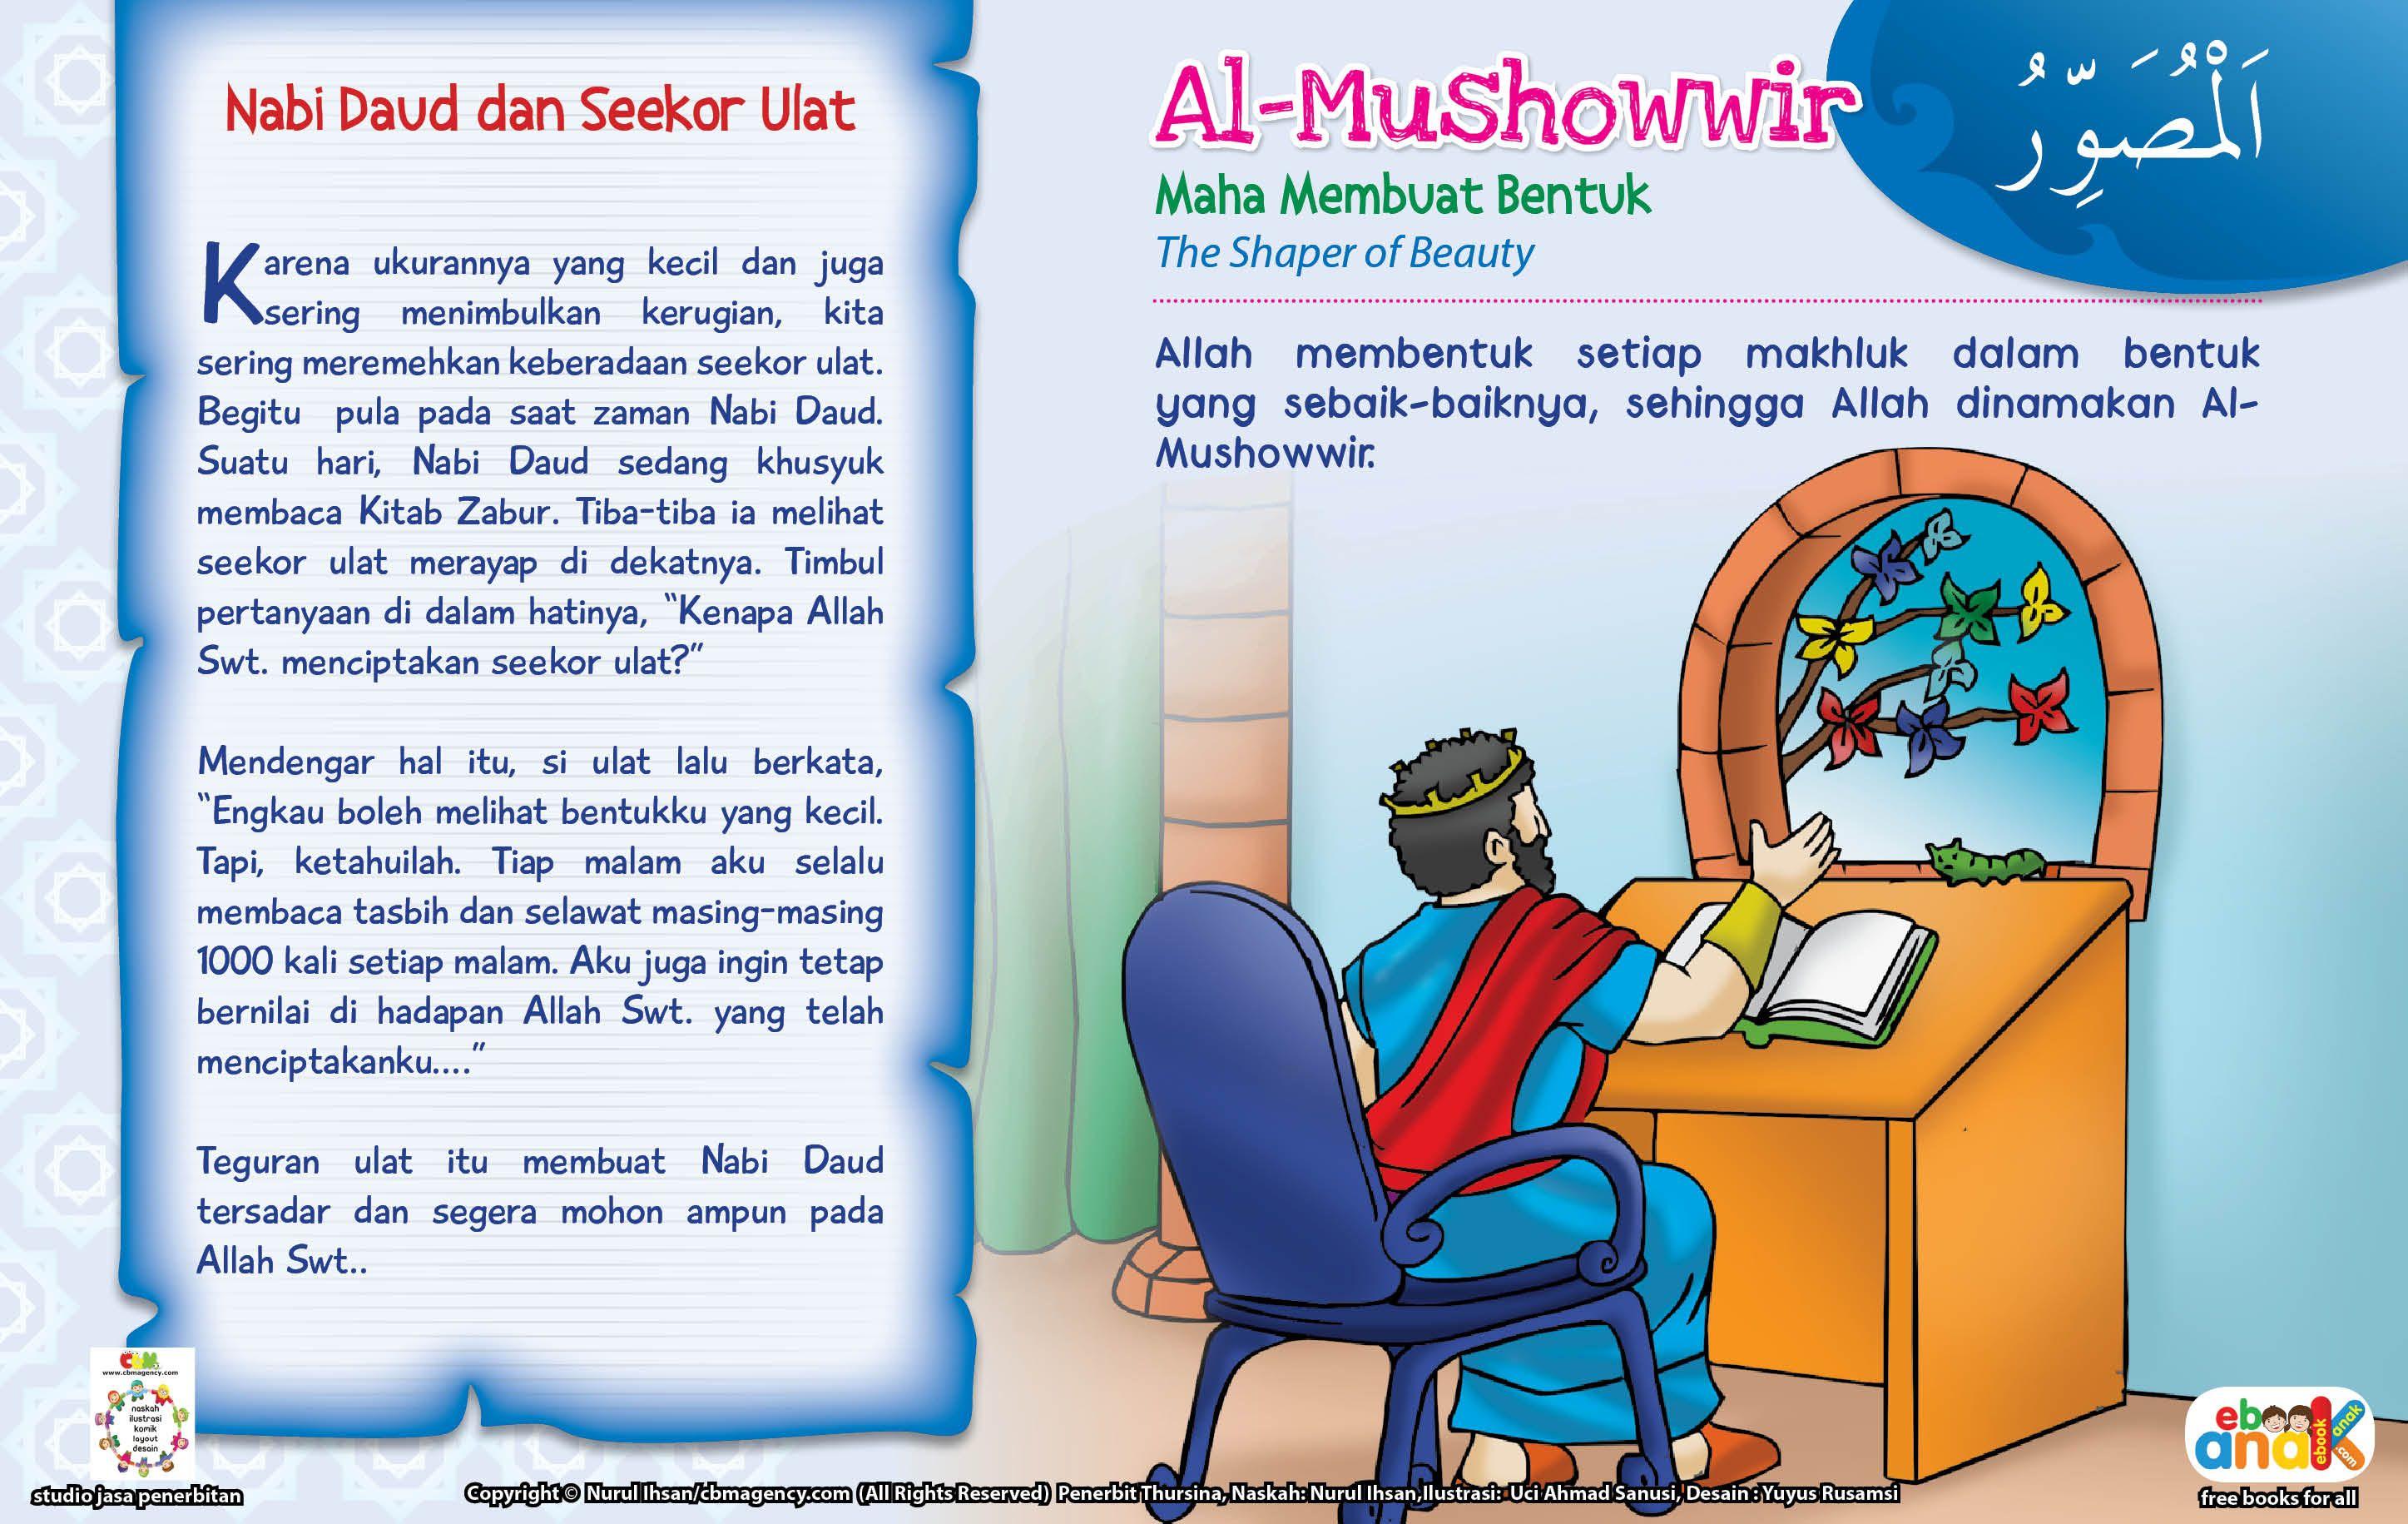 Kisah Asmaul Husna AlMushowwir Sahabat, Anak, Pendidikan